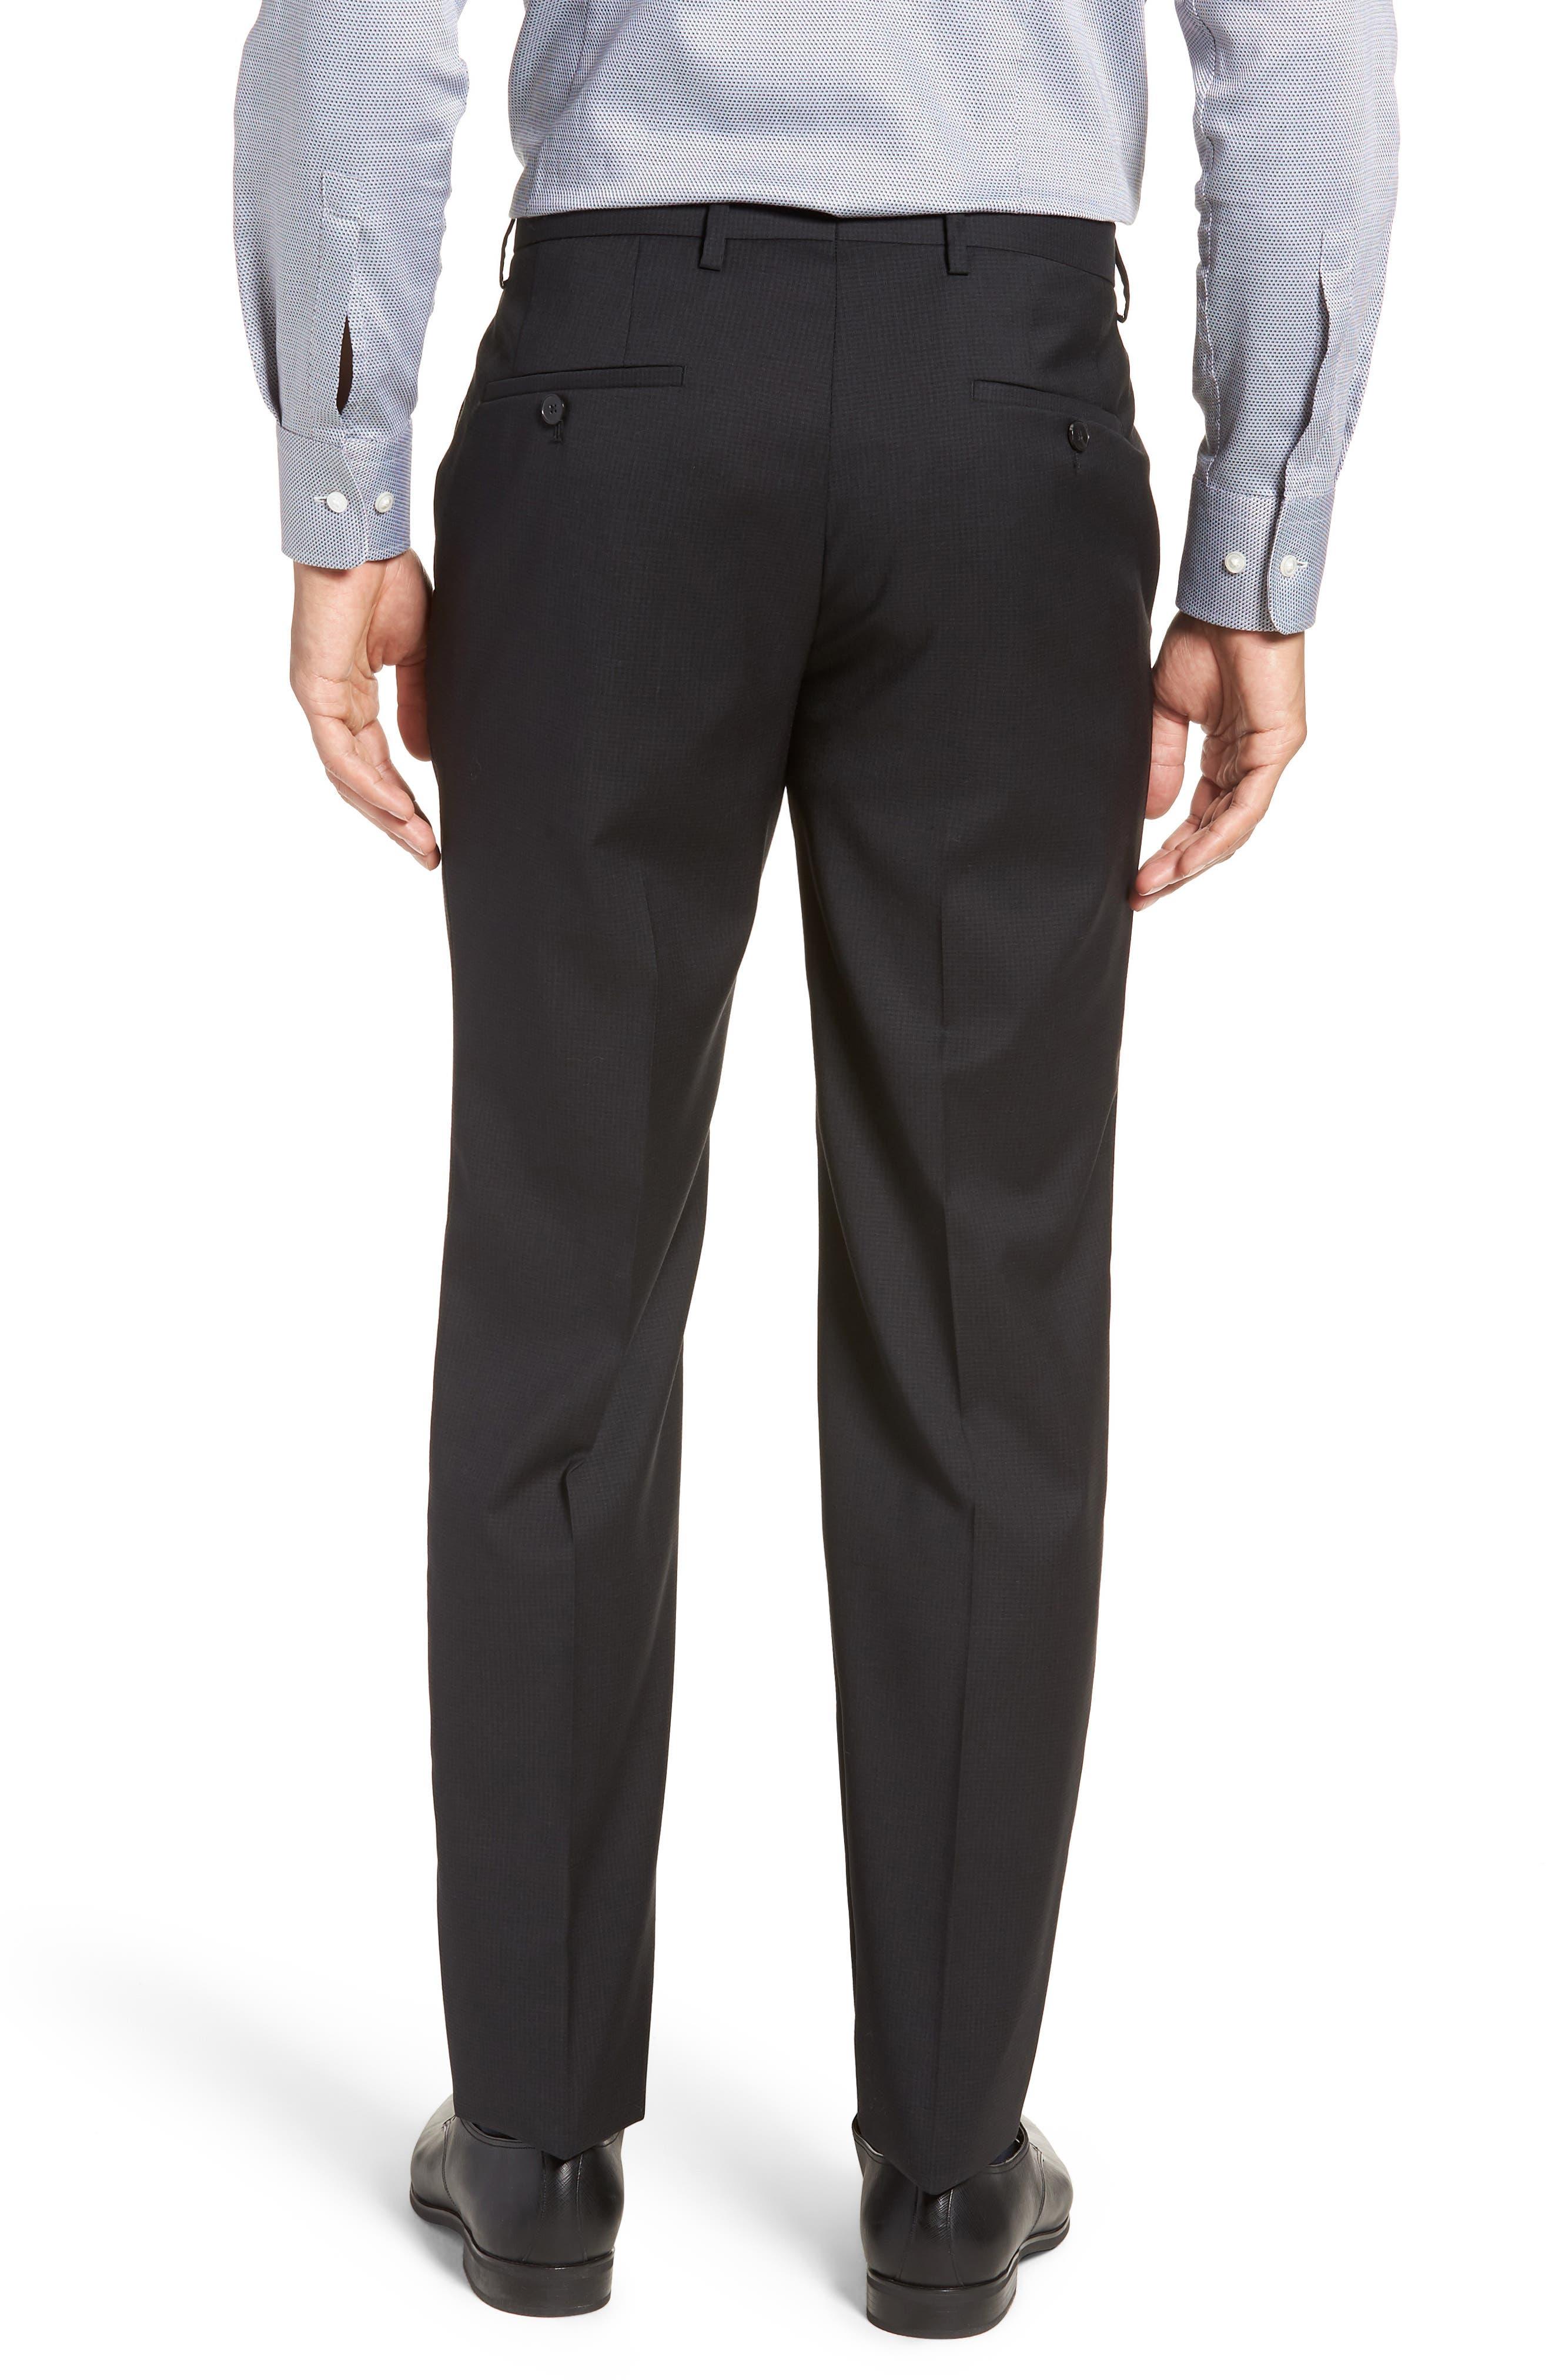 Leenon Flat Front Check Wool Trousers,                             Alternate thumbnail 2, color,                             BLACK